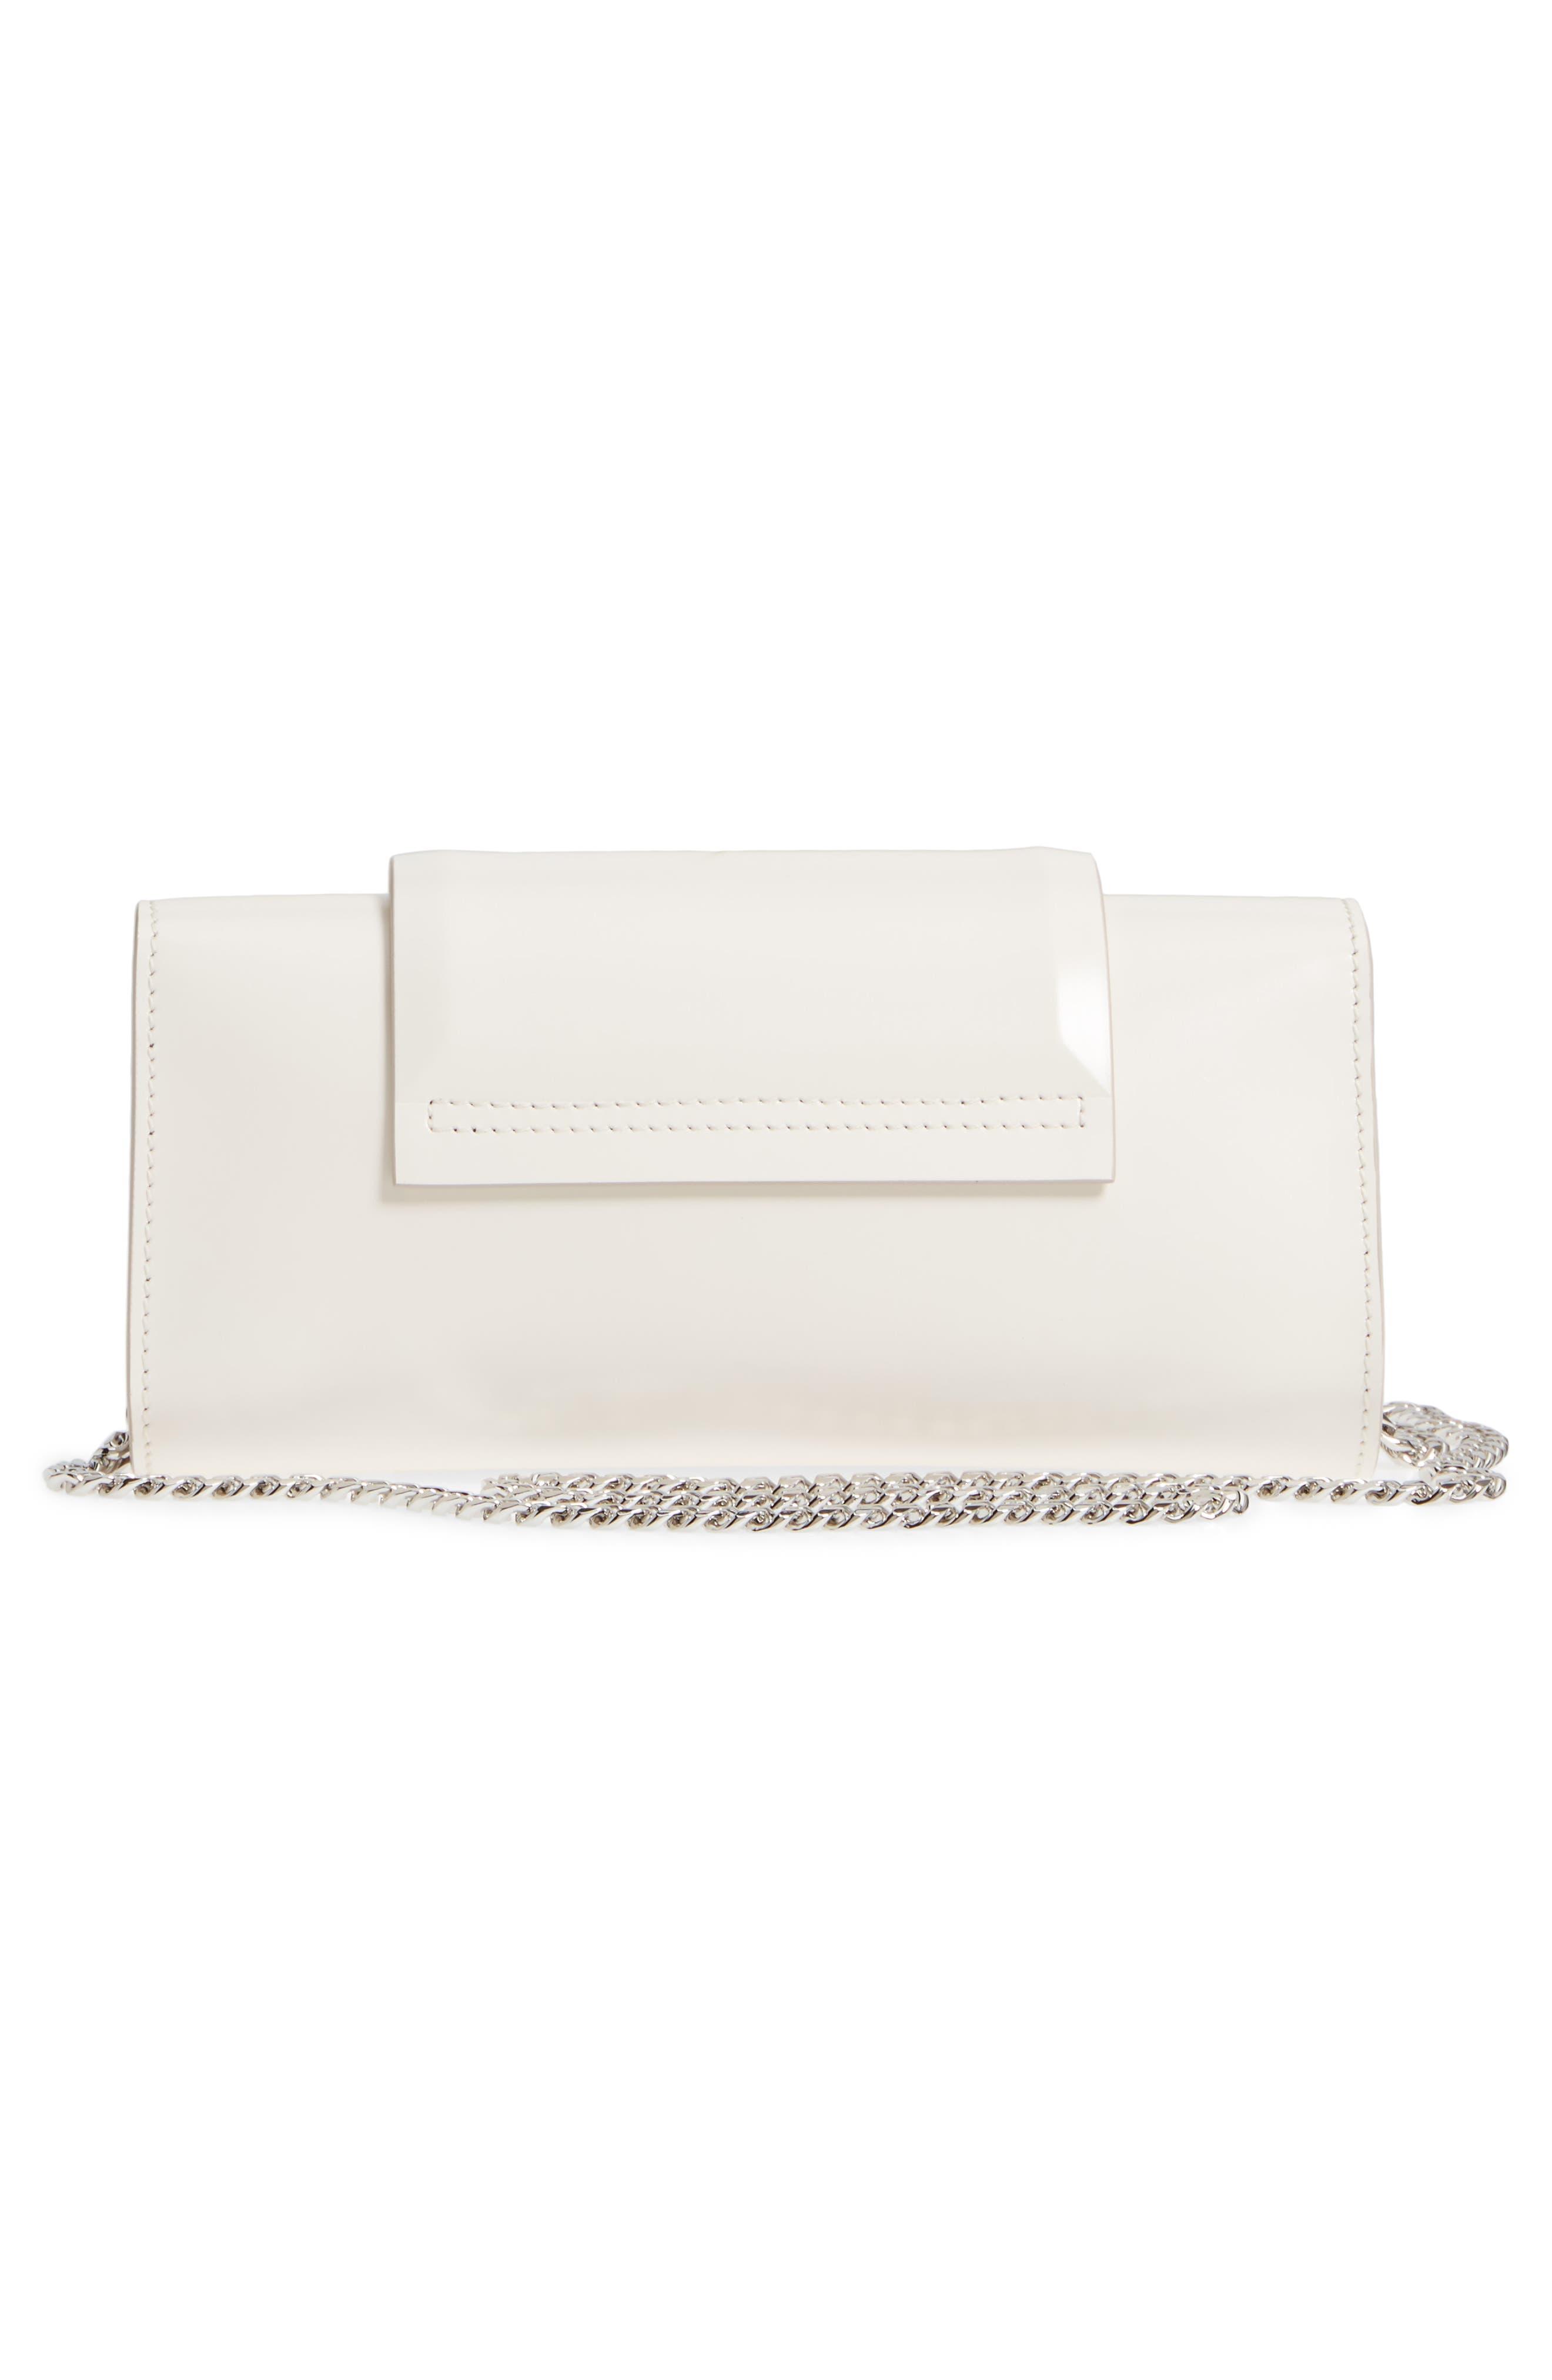 Mini Infinity Calfskin Leather Shoulder/Crossbody Bag,                             Alternate thumbnail 6, color,